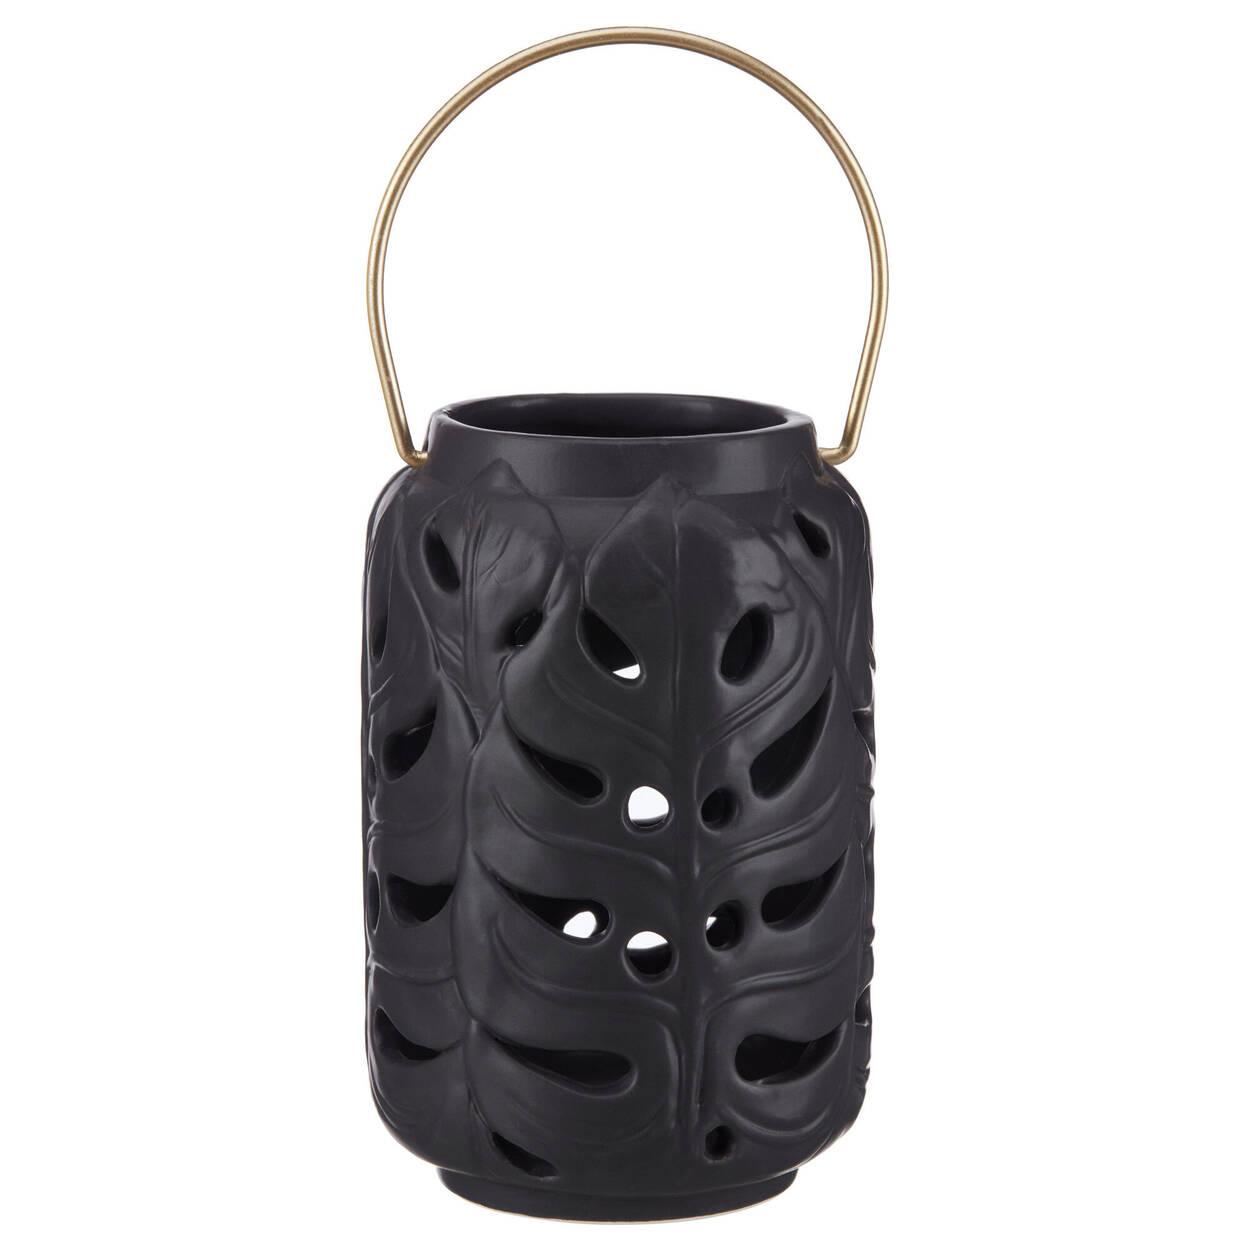 Porte-chandelle lanterne en dolomite noire